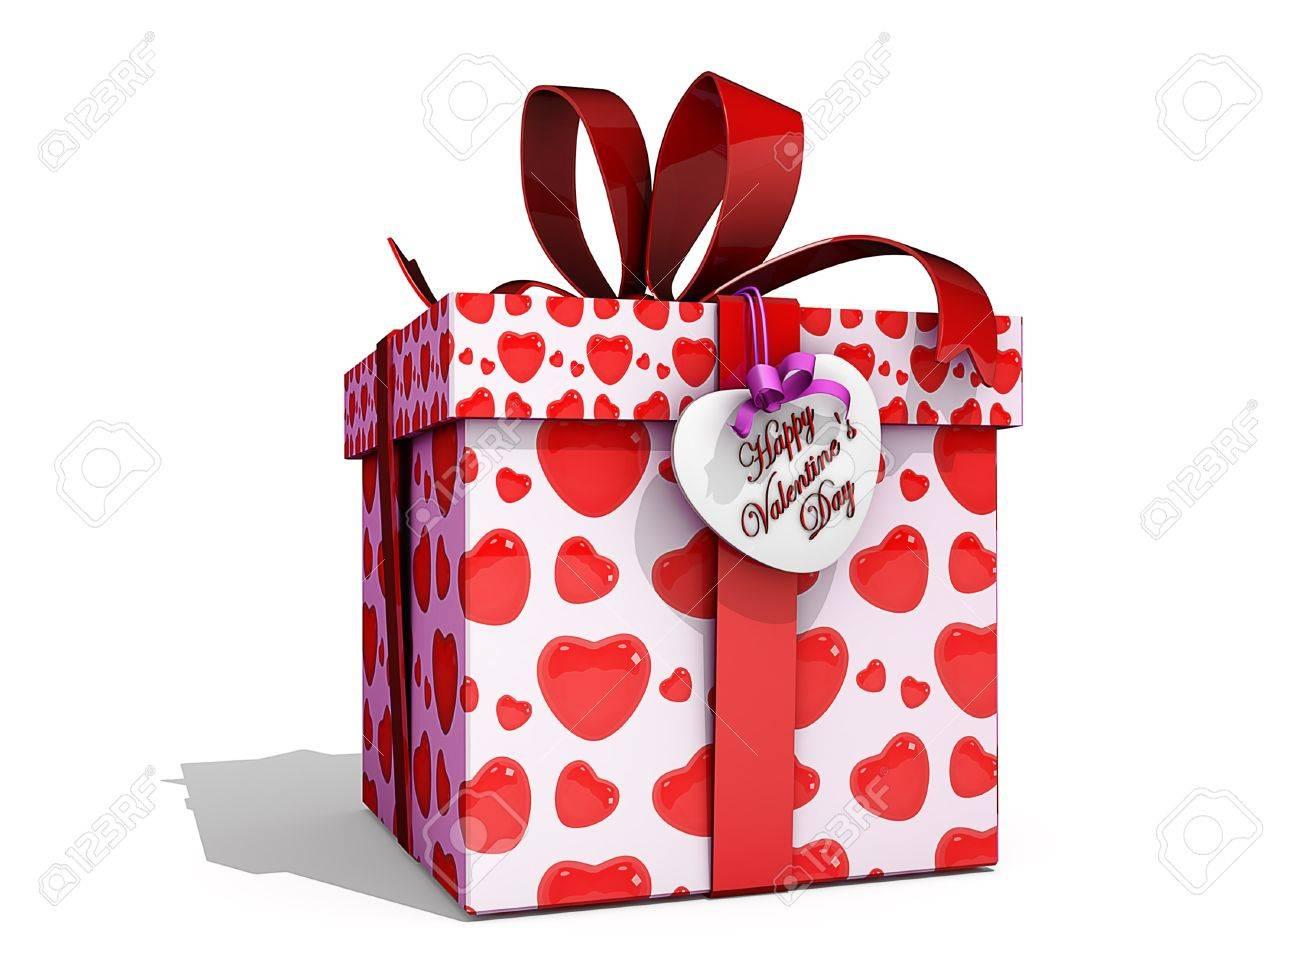 Valentine's Gift Box on a white background. Stock Photo - 11772720